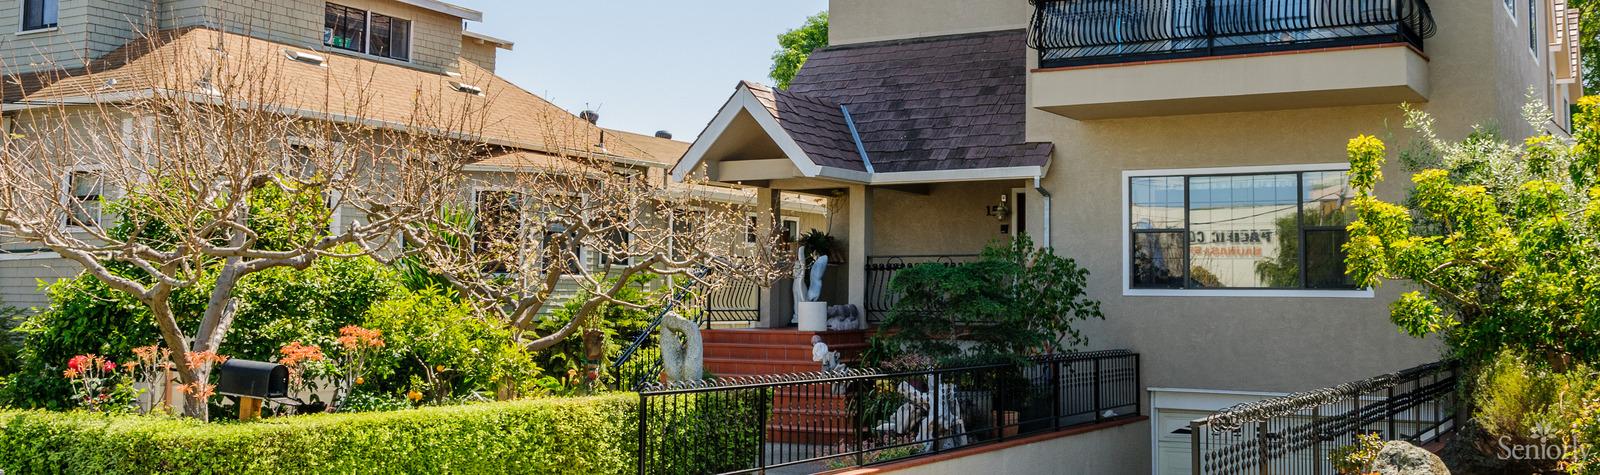 B&B Residential Facilities (15 W) San Mateo CA 3